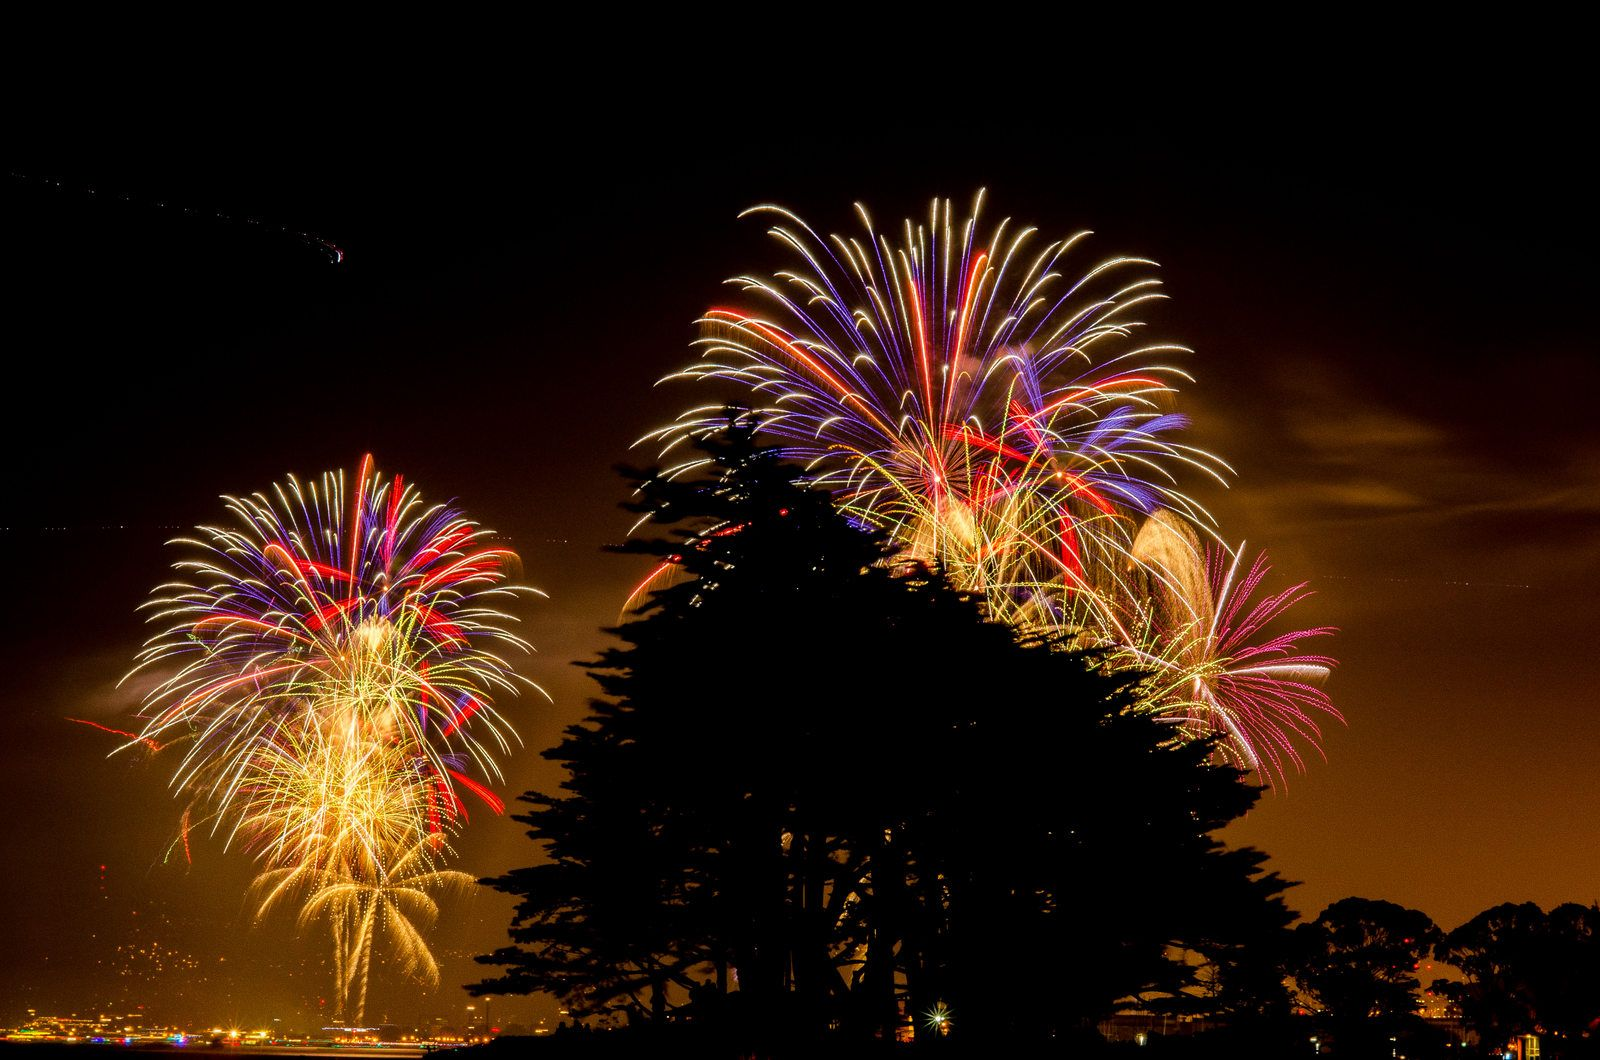 #photography July Fourth Fireworks - San Francisco California